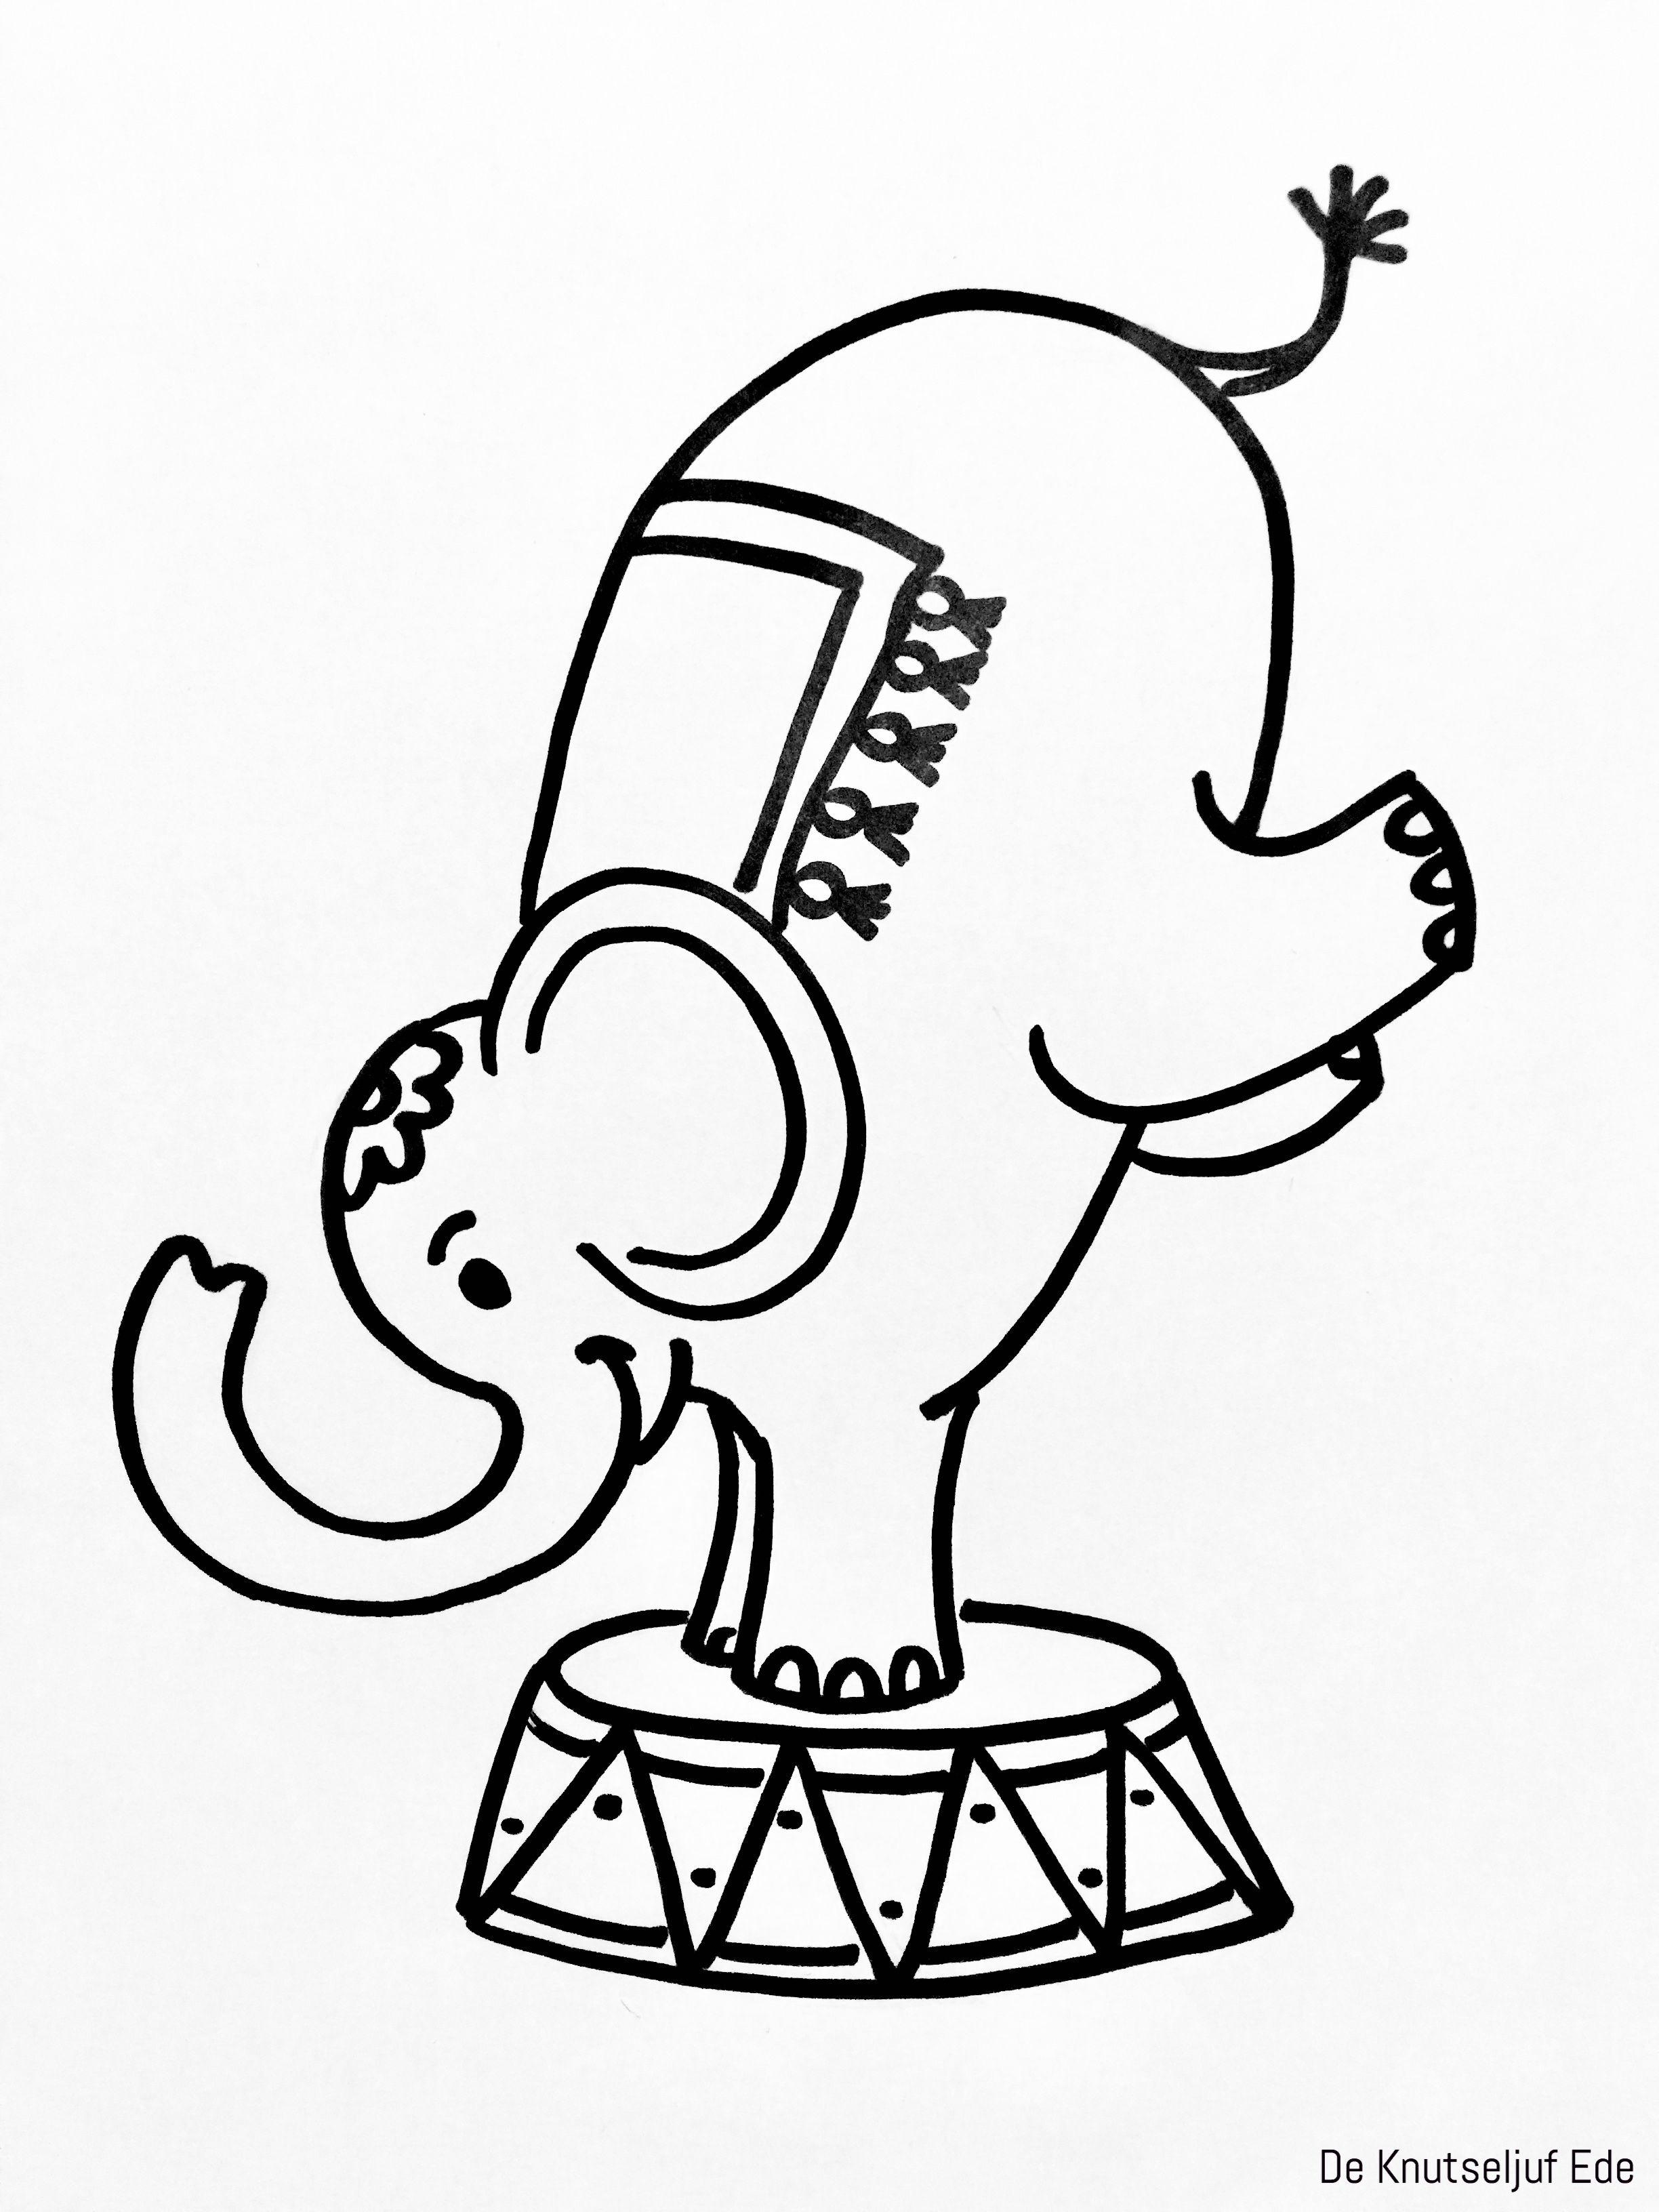 Circus Olifant Knutselen Van Karton En Wasknijpers Circus Knutsel Ideeen Knutseltips Circus 6 Circus Olifanten Olifant Knutselen Circus